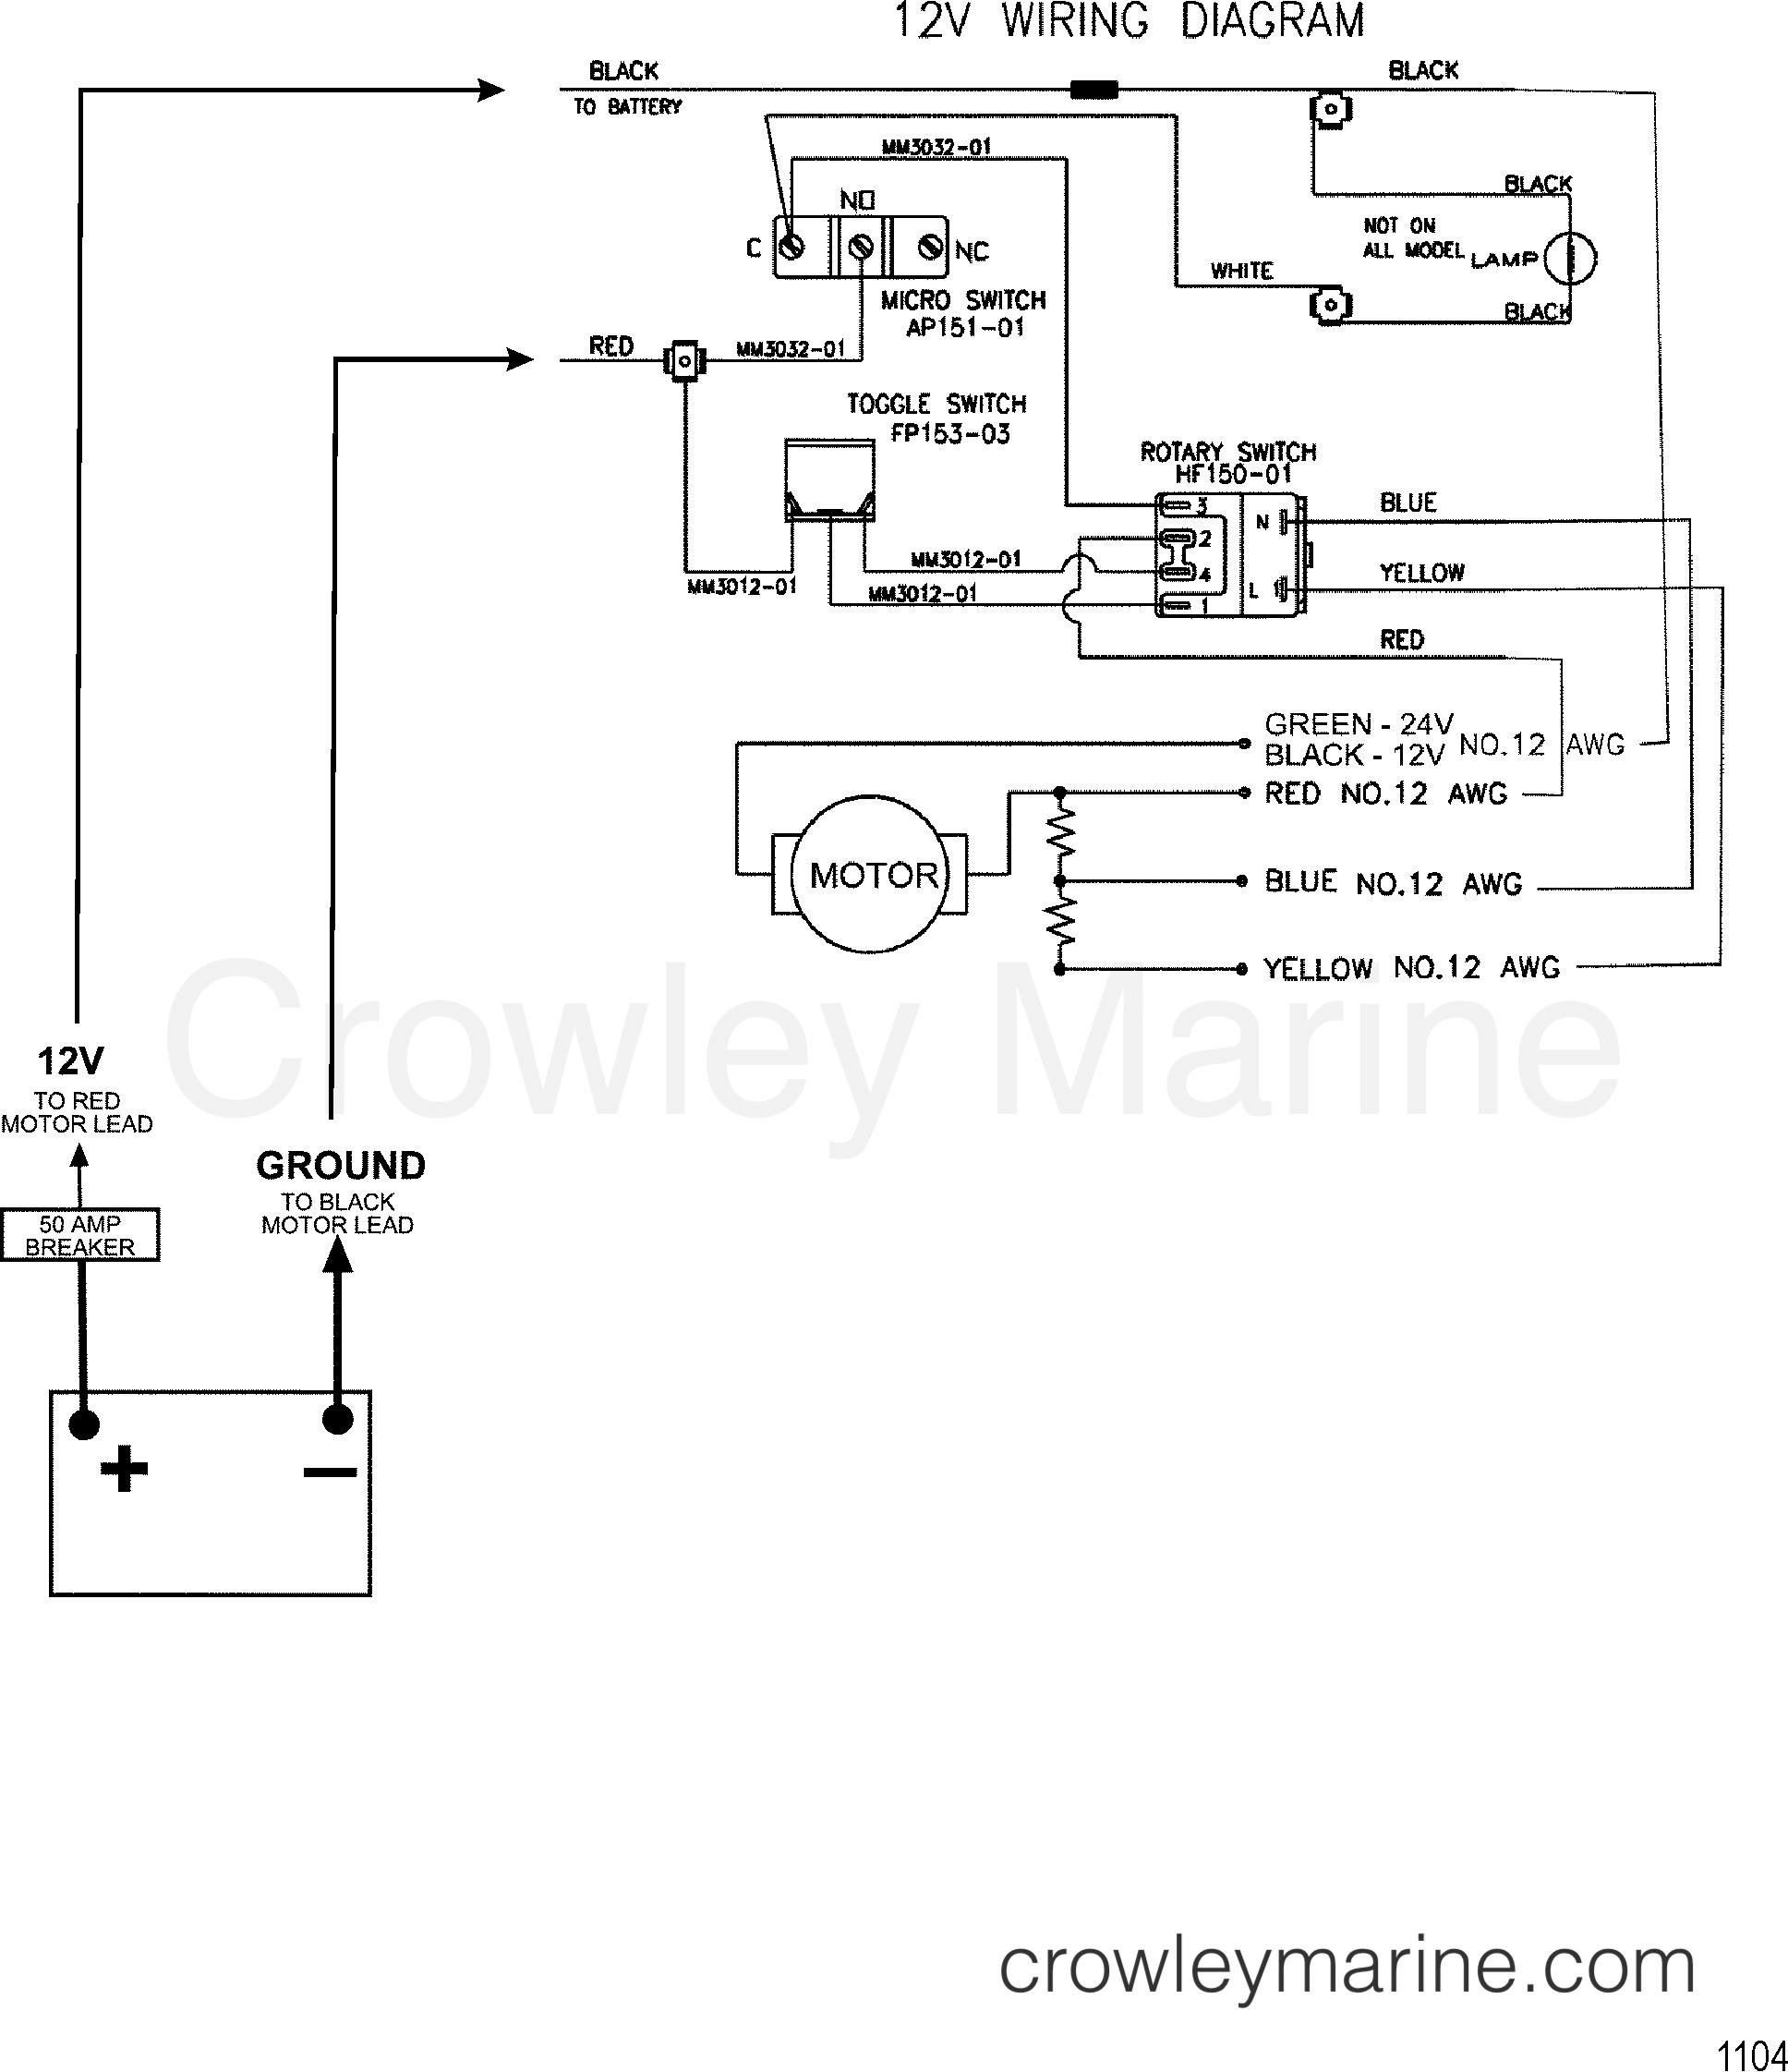 wire diagram model 743 12 volt 1999 motorguide motorguide rh crowleymarine com motorguide varimax wiring diagram motorguide 24v trolling motor wiring diagram